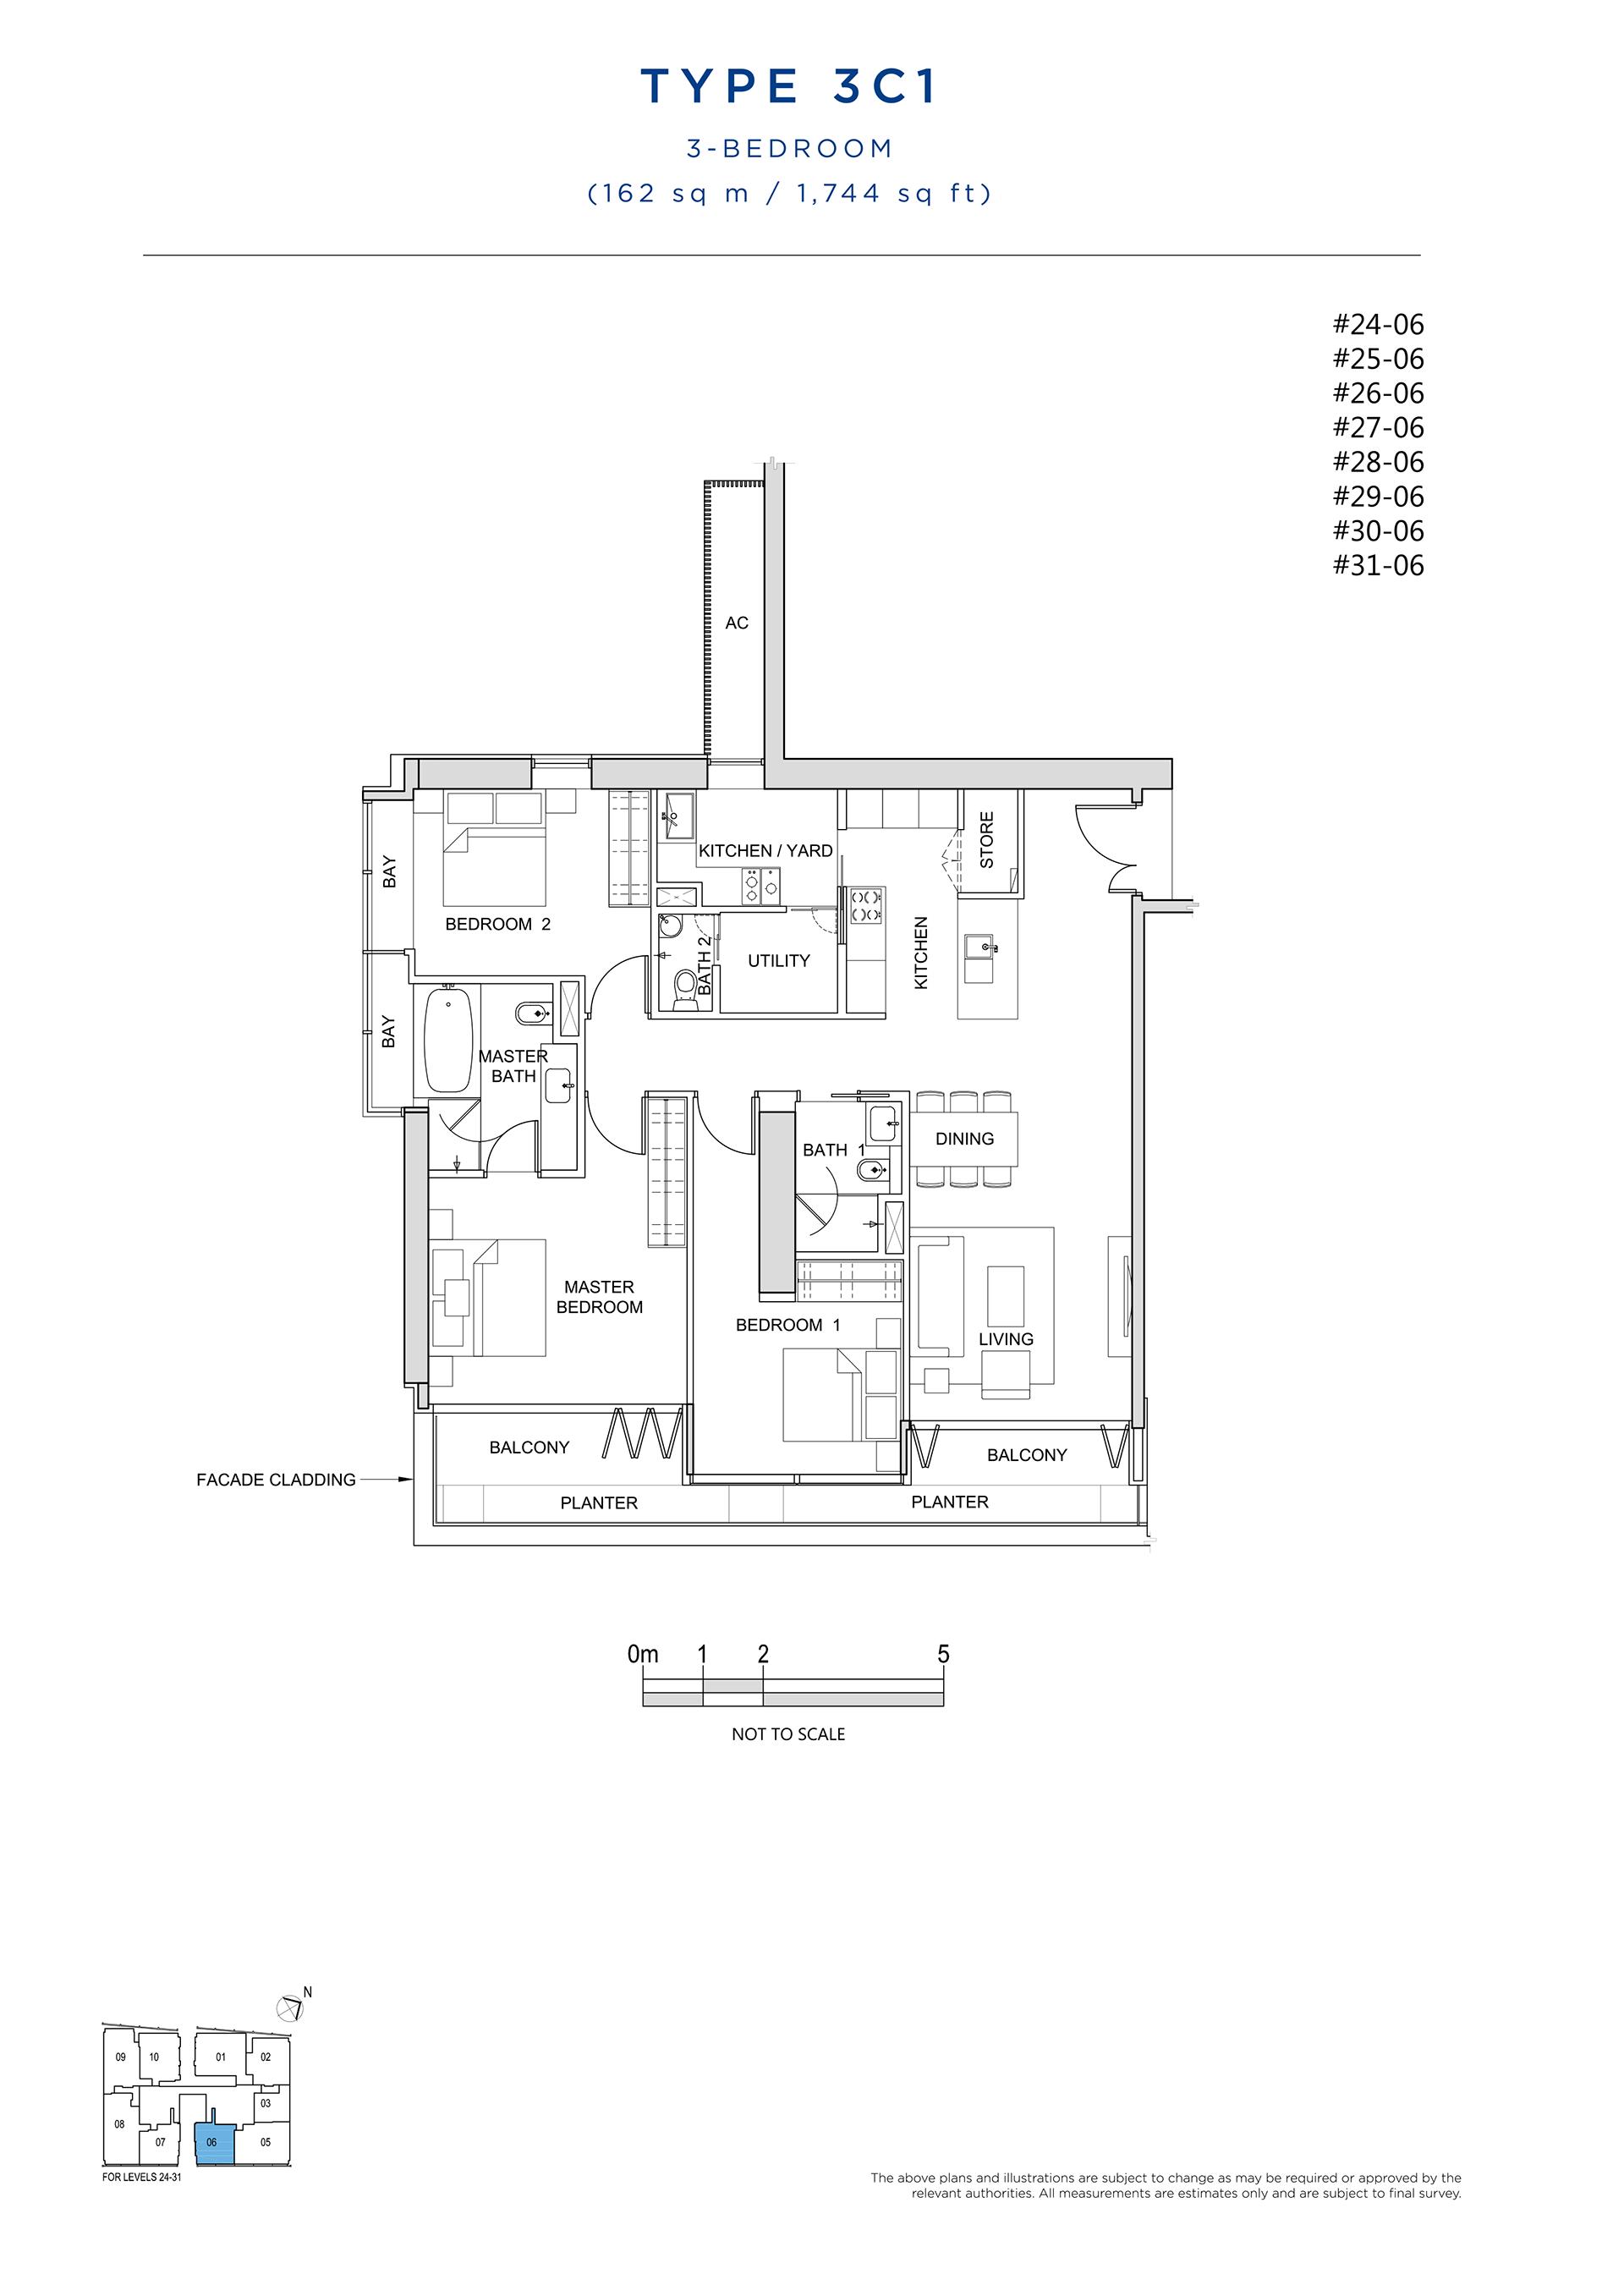 South Beach Residences 3 Bedroom Floor Plan Type 3C1